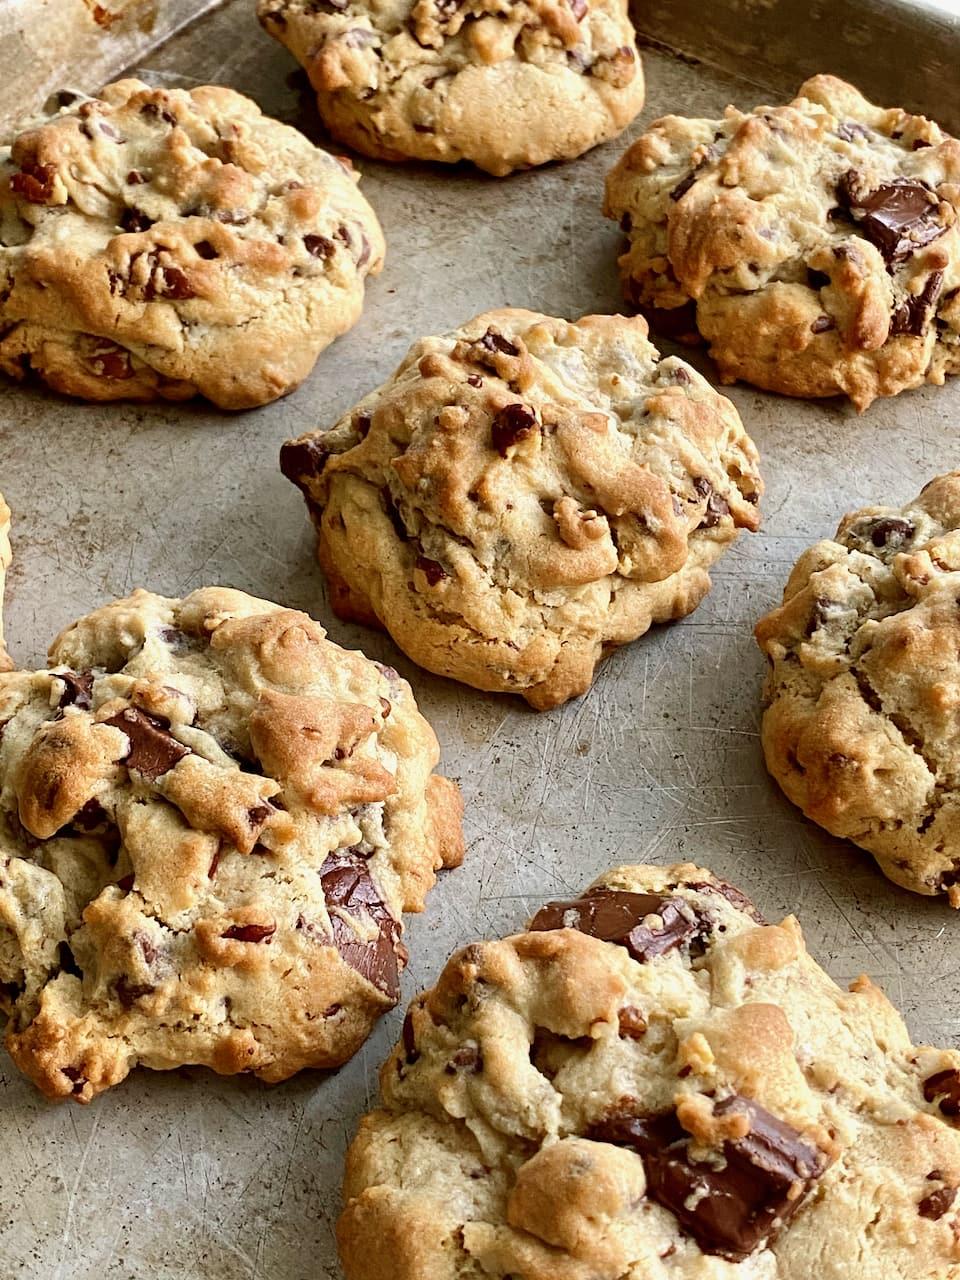 Santa's Chocolate Chip Cookies on a sheet pan